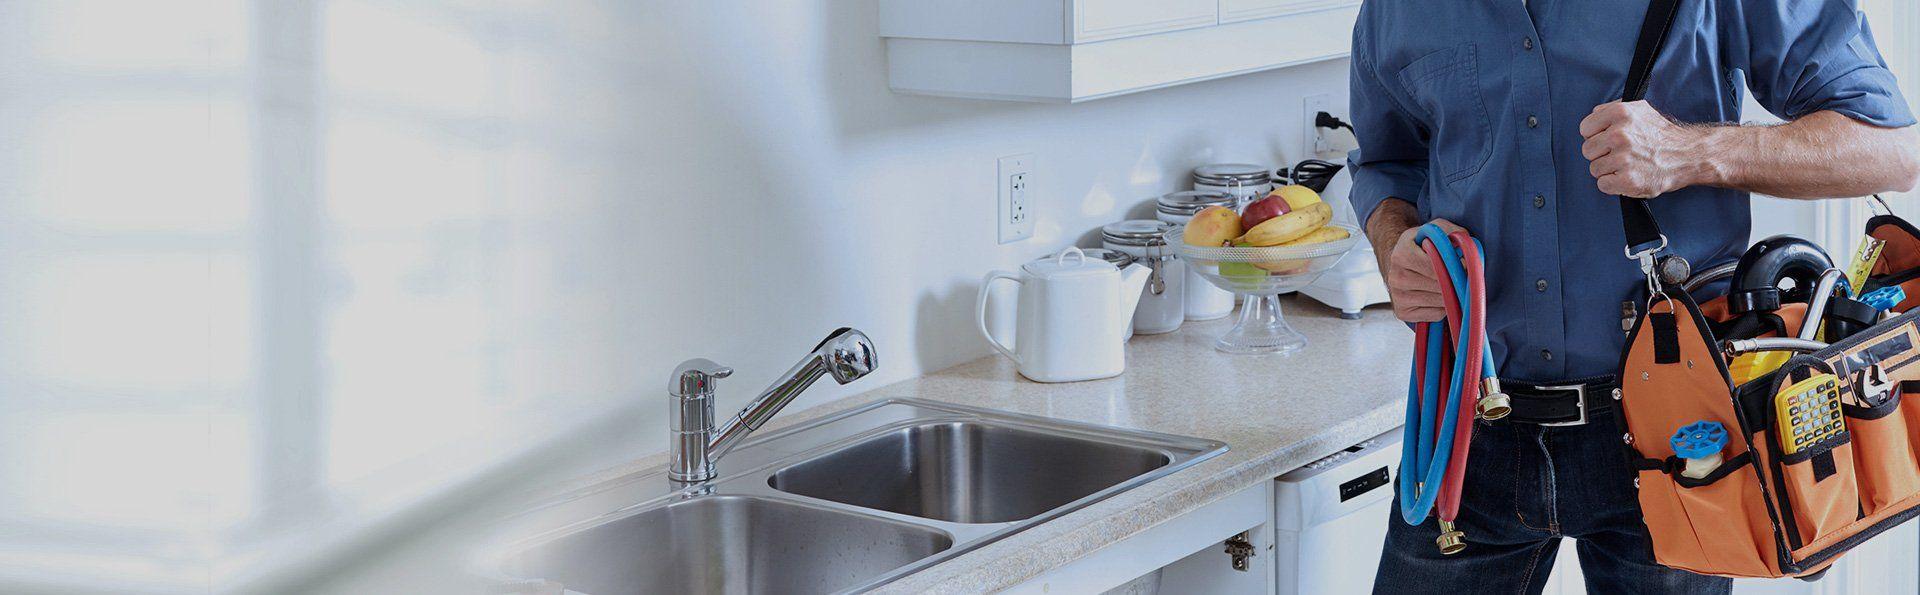 Plumbing Companies Toronto Licensed, Insured and